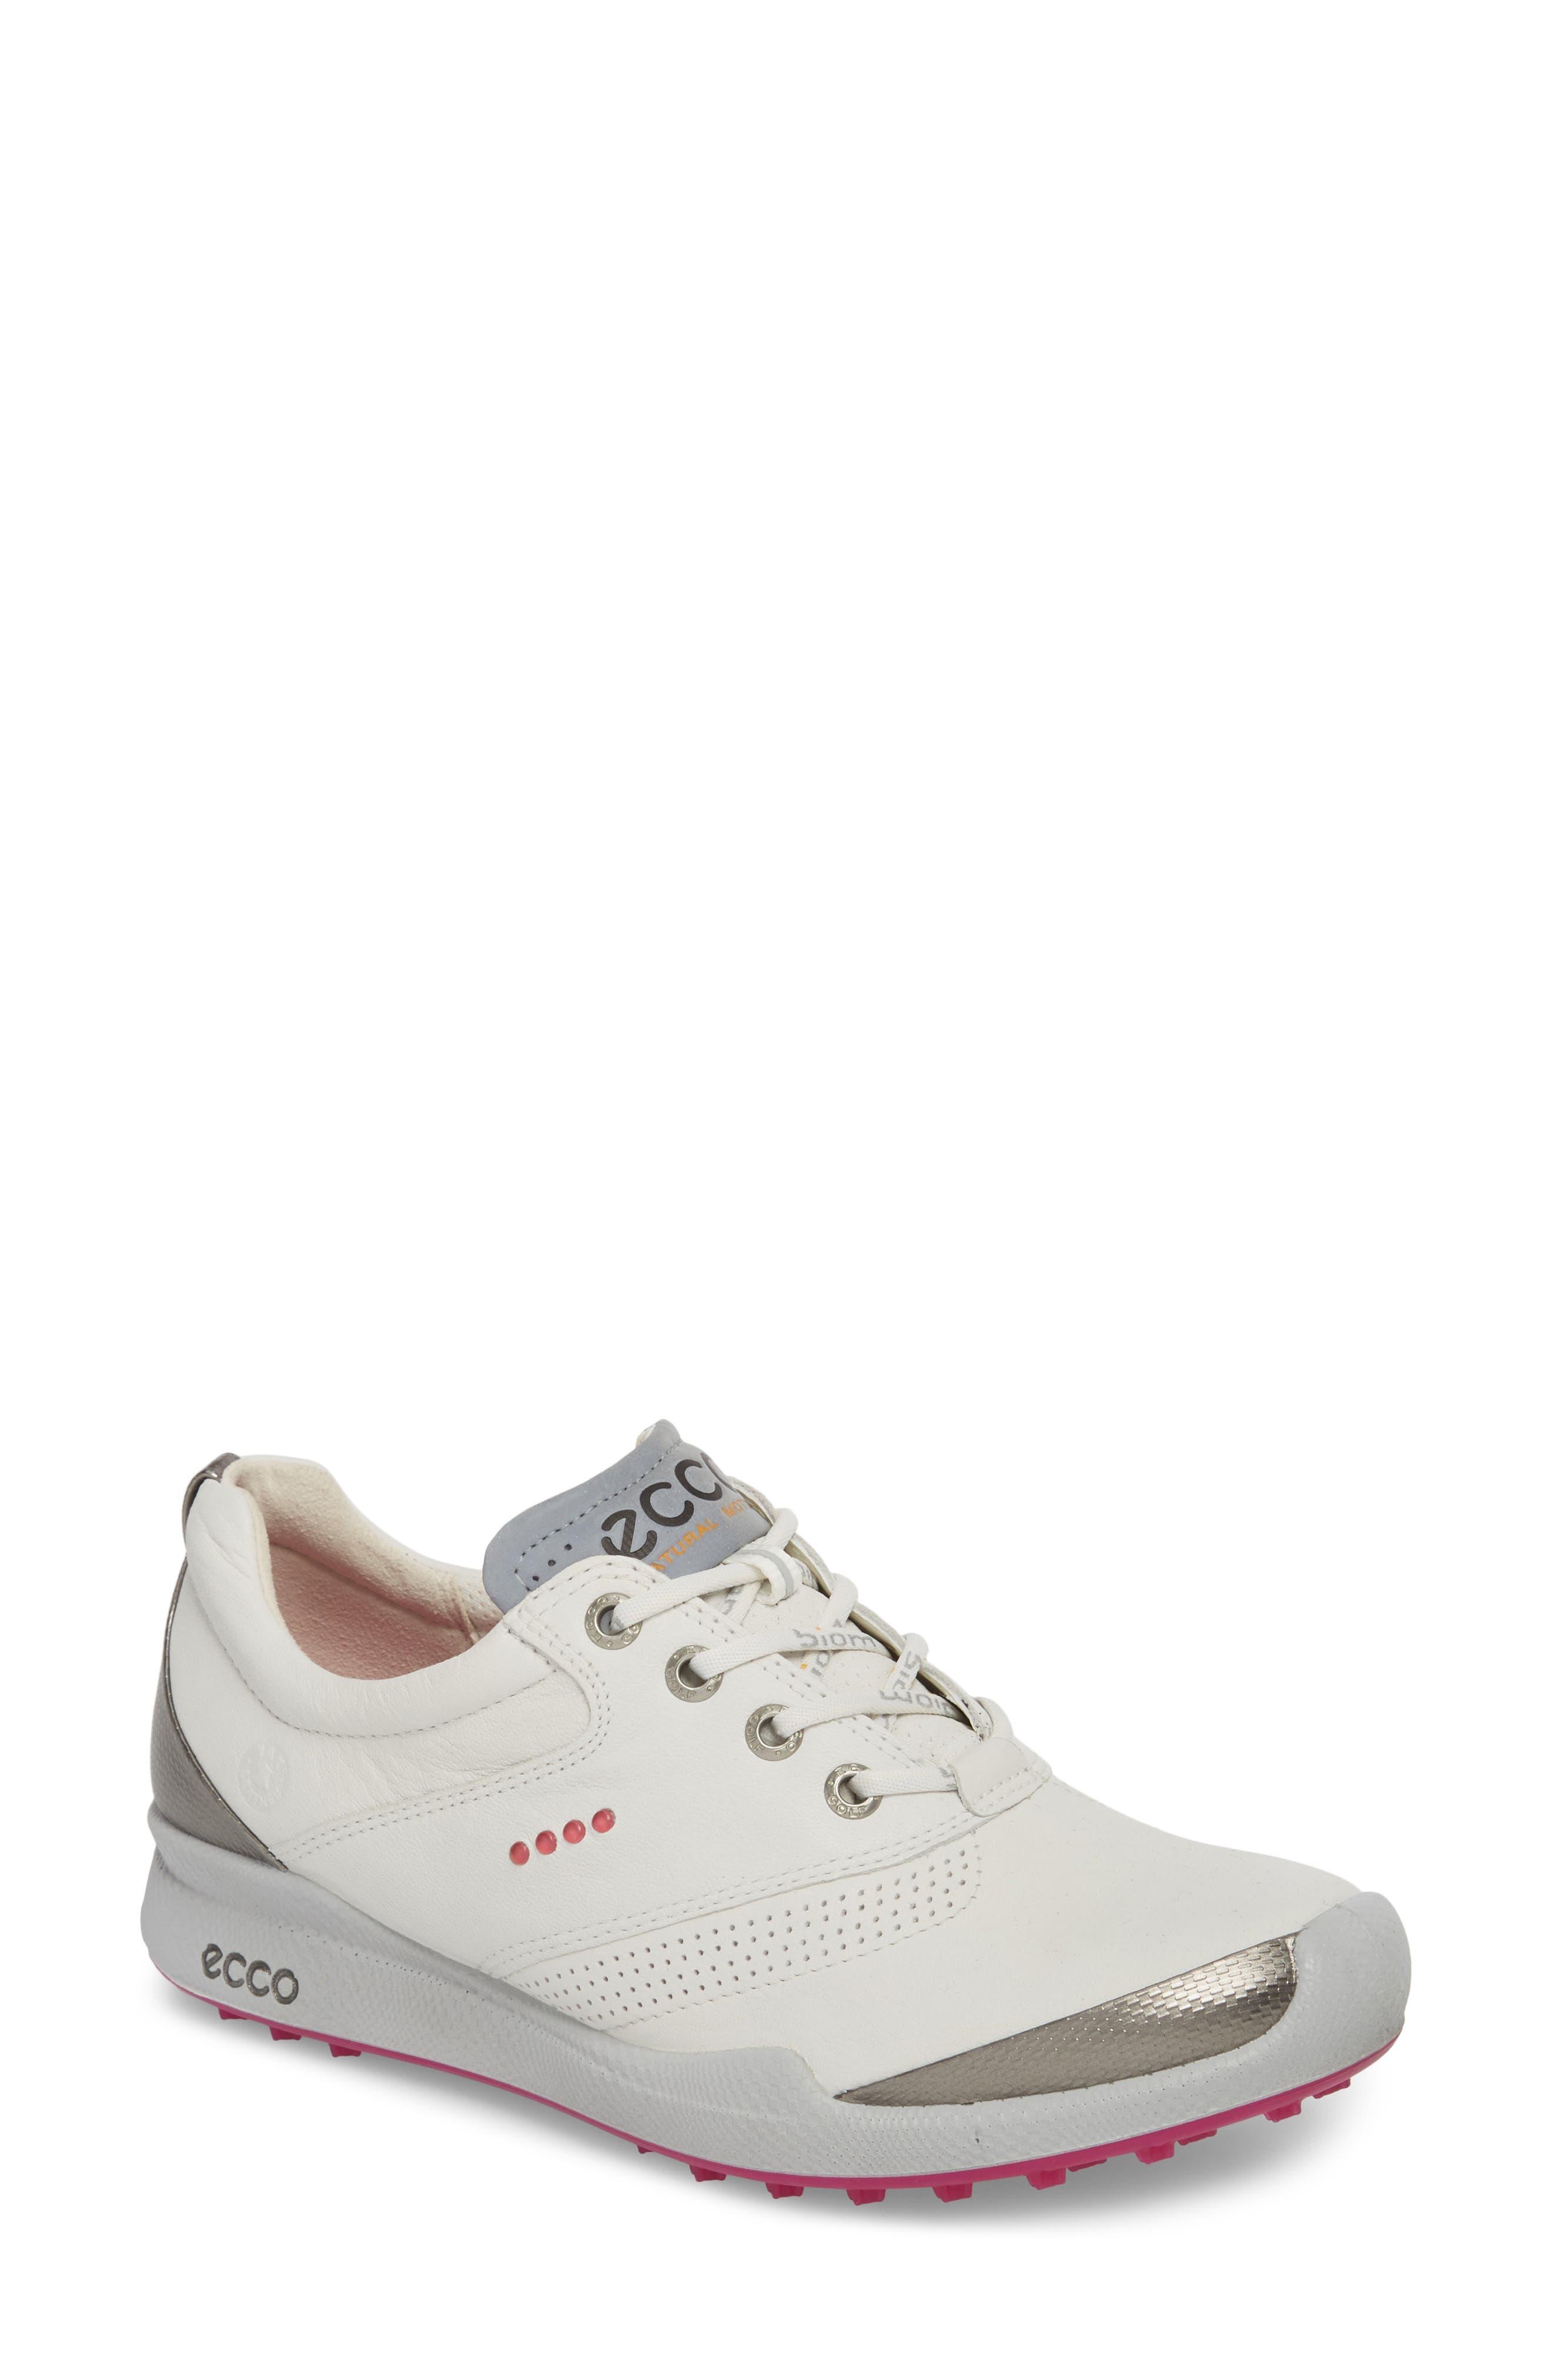 Biom Hybrid Golf Shoe,                             Main thumbnail 1, color,